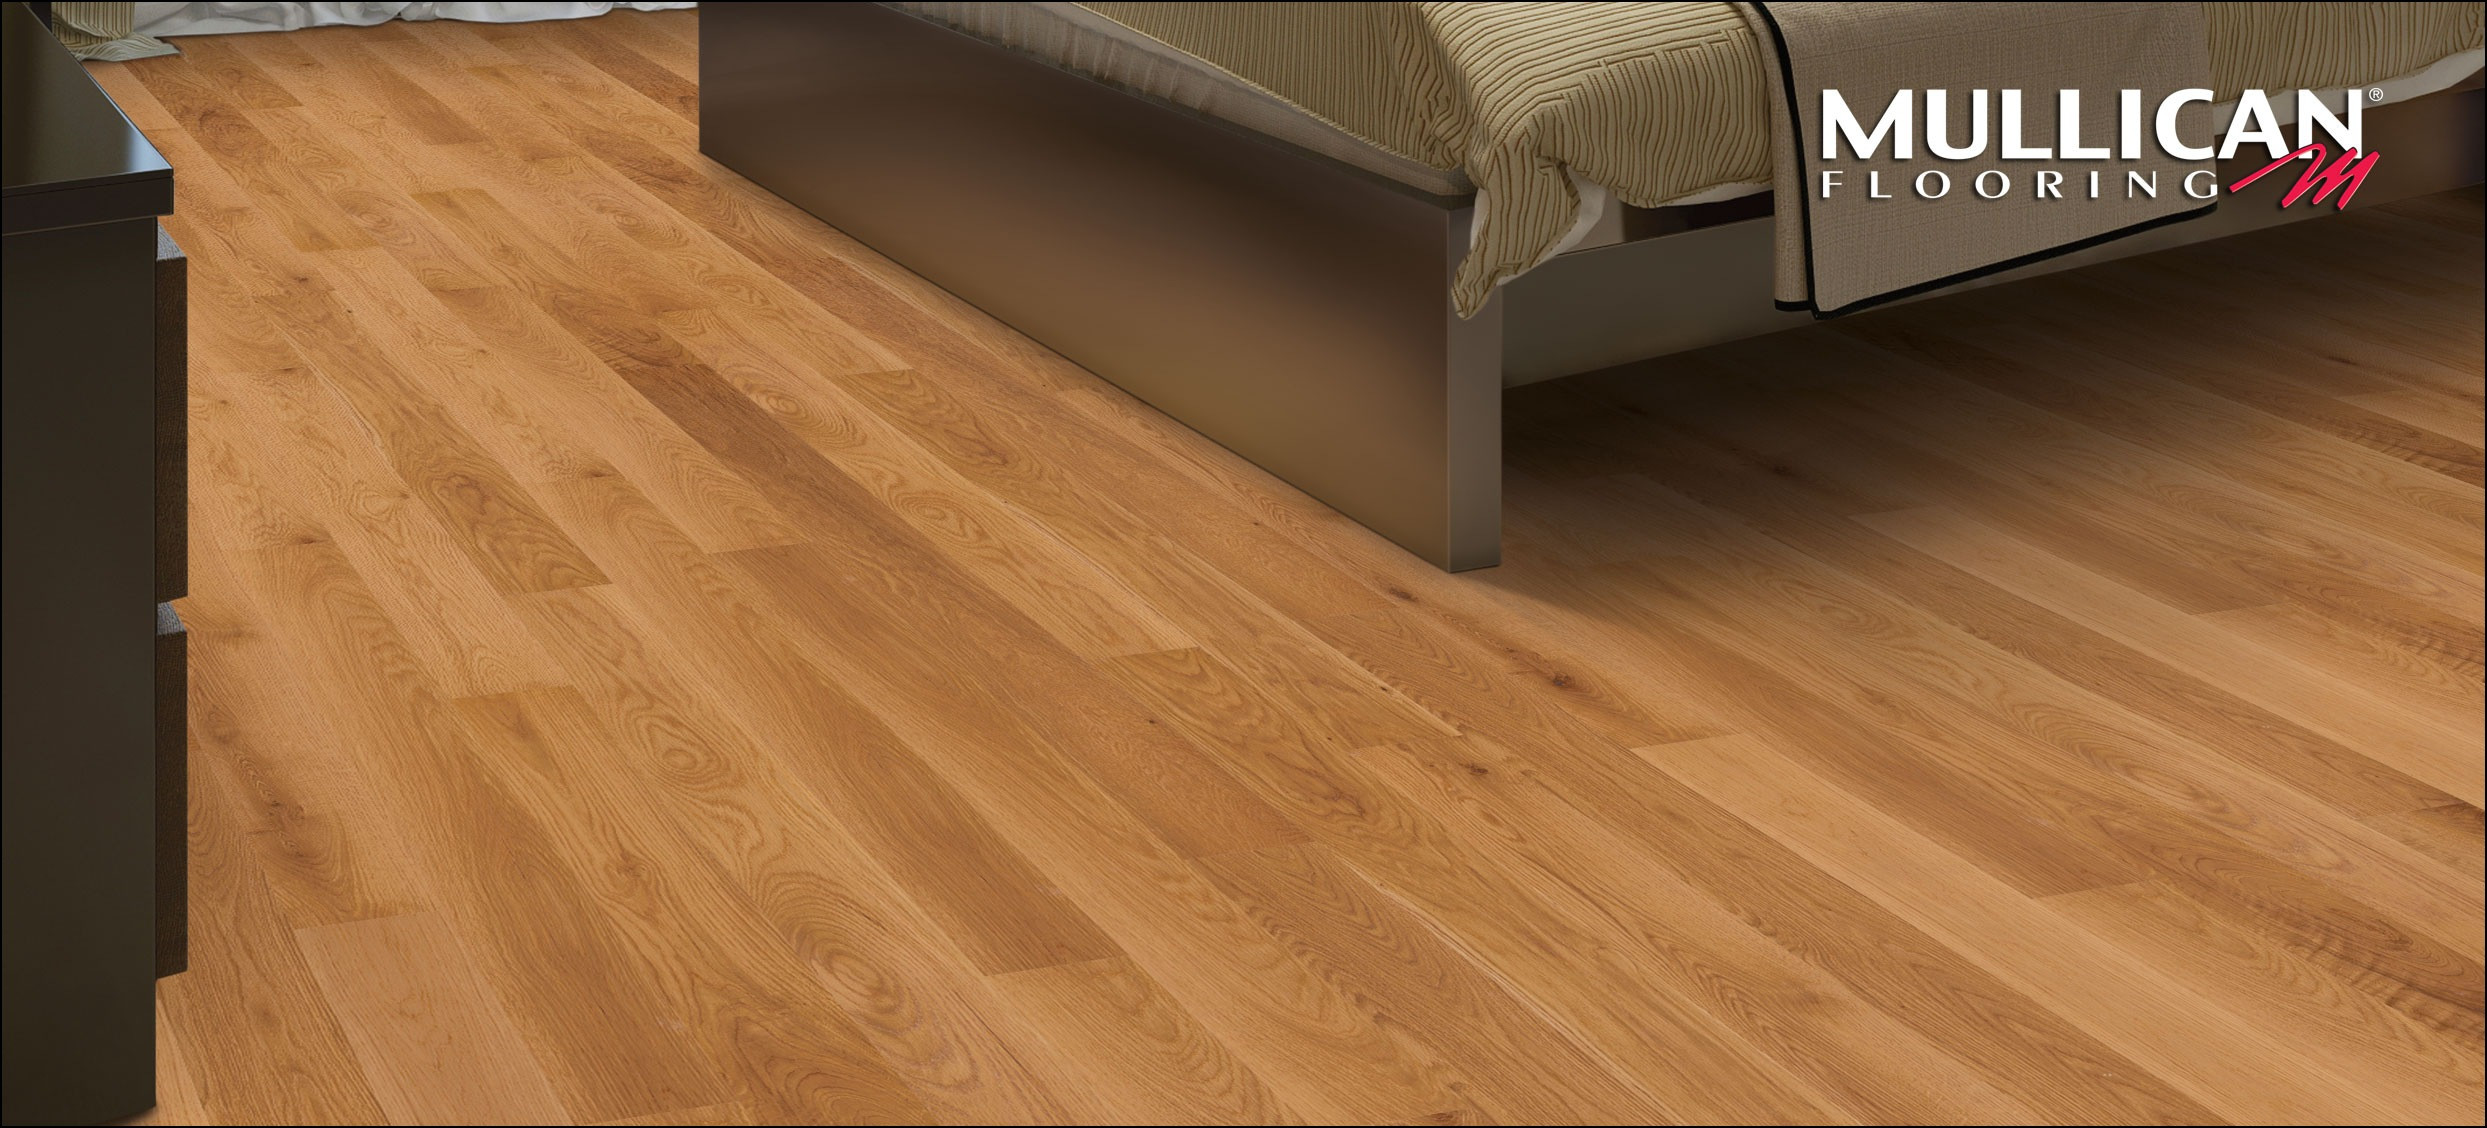 exotic hardwood flooring manufacturers of hardwood flooring suppliers france flooring ideas throughout hardwood flooring installation san diego collection mullican flooring home of hardwood flooring installation san diego